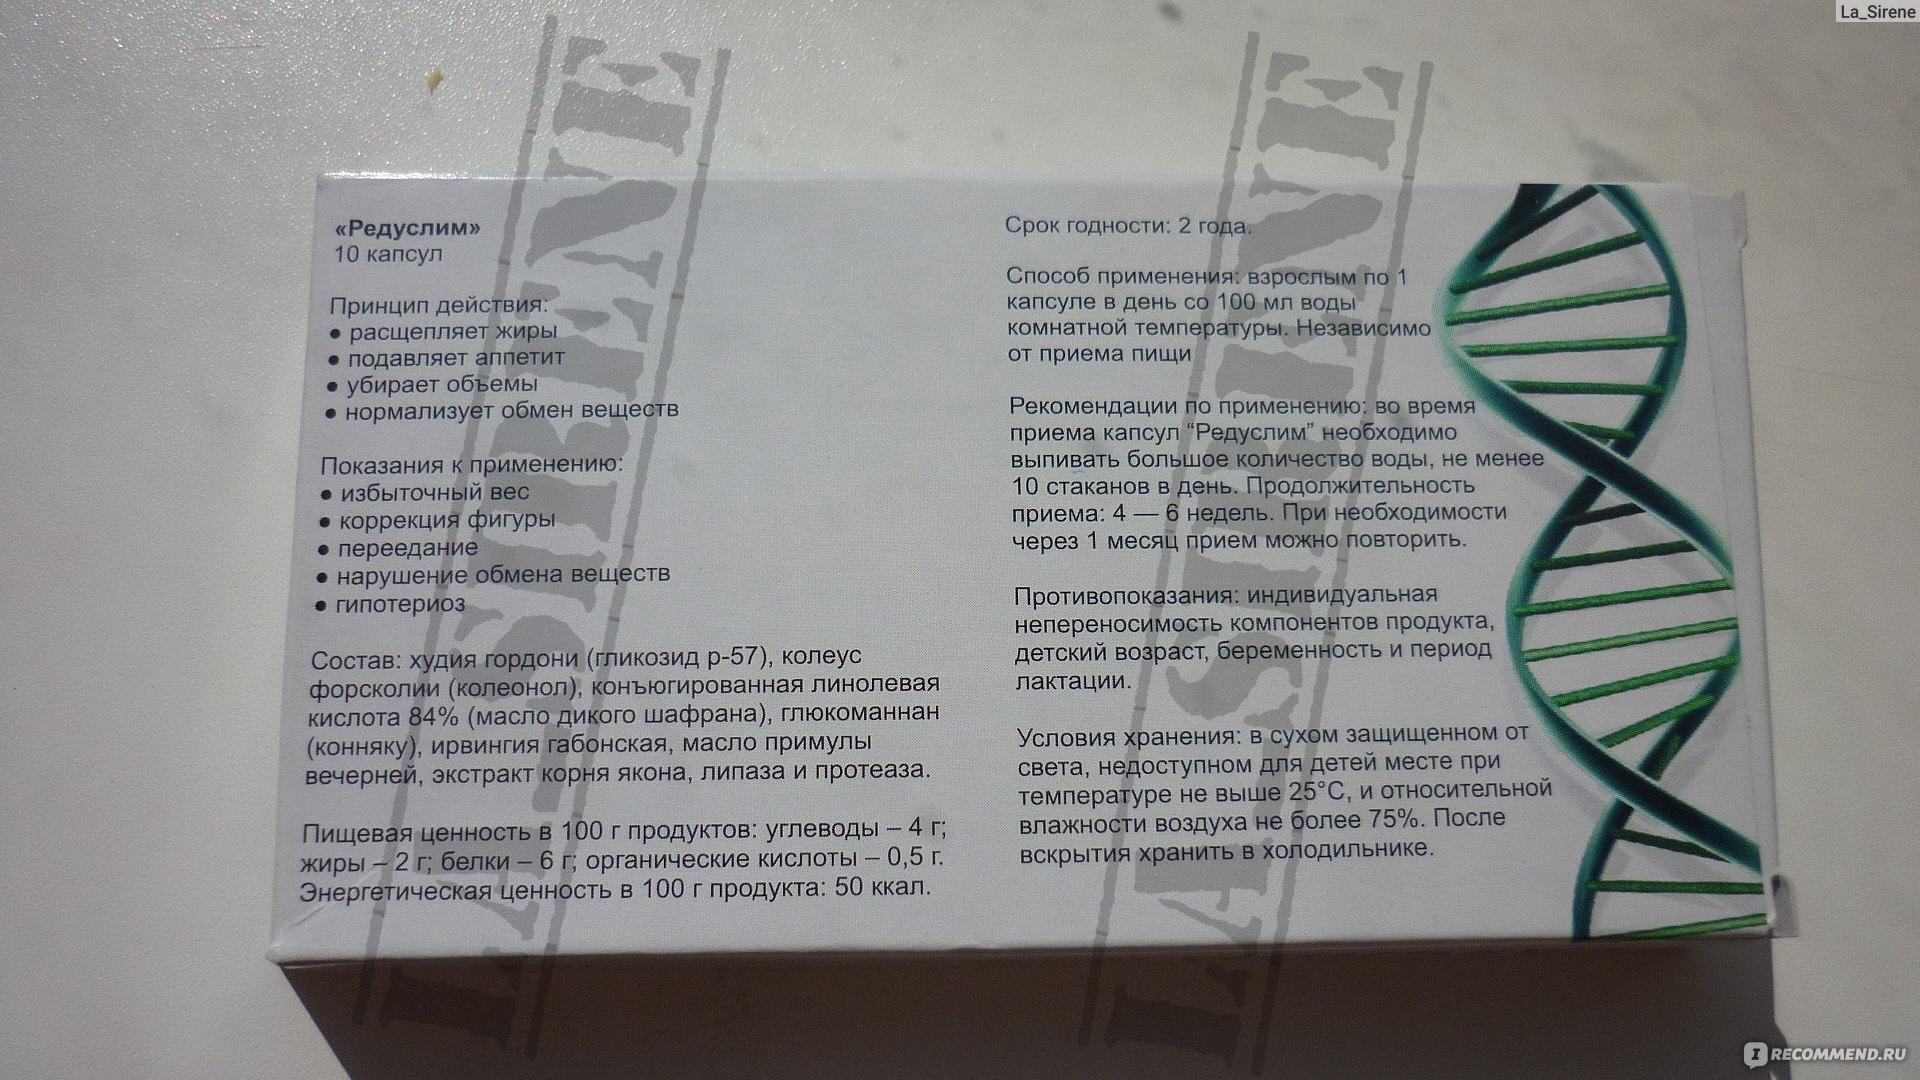 цена редуслима в аптеке ьги